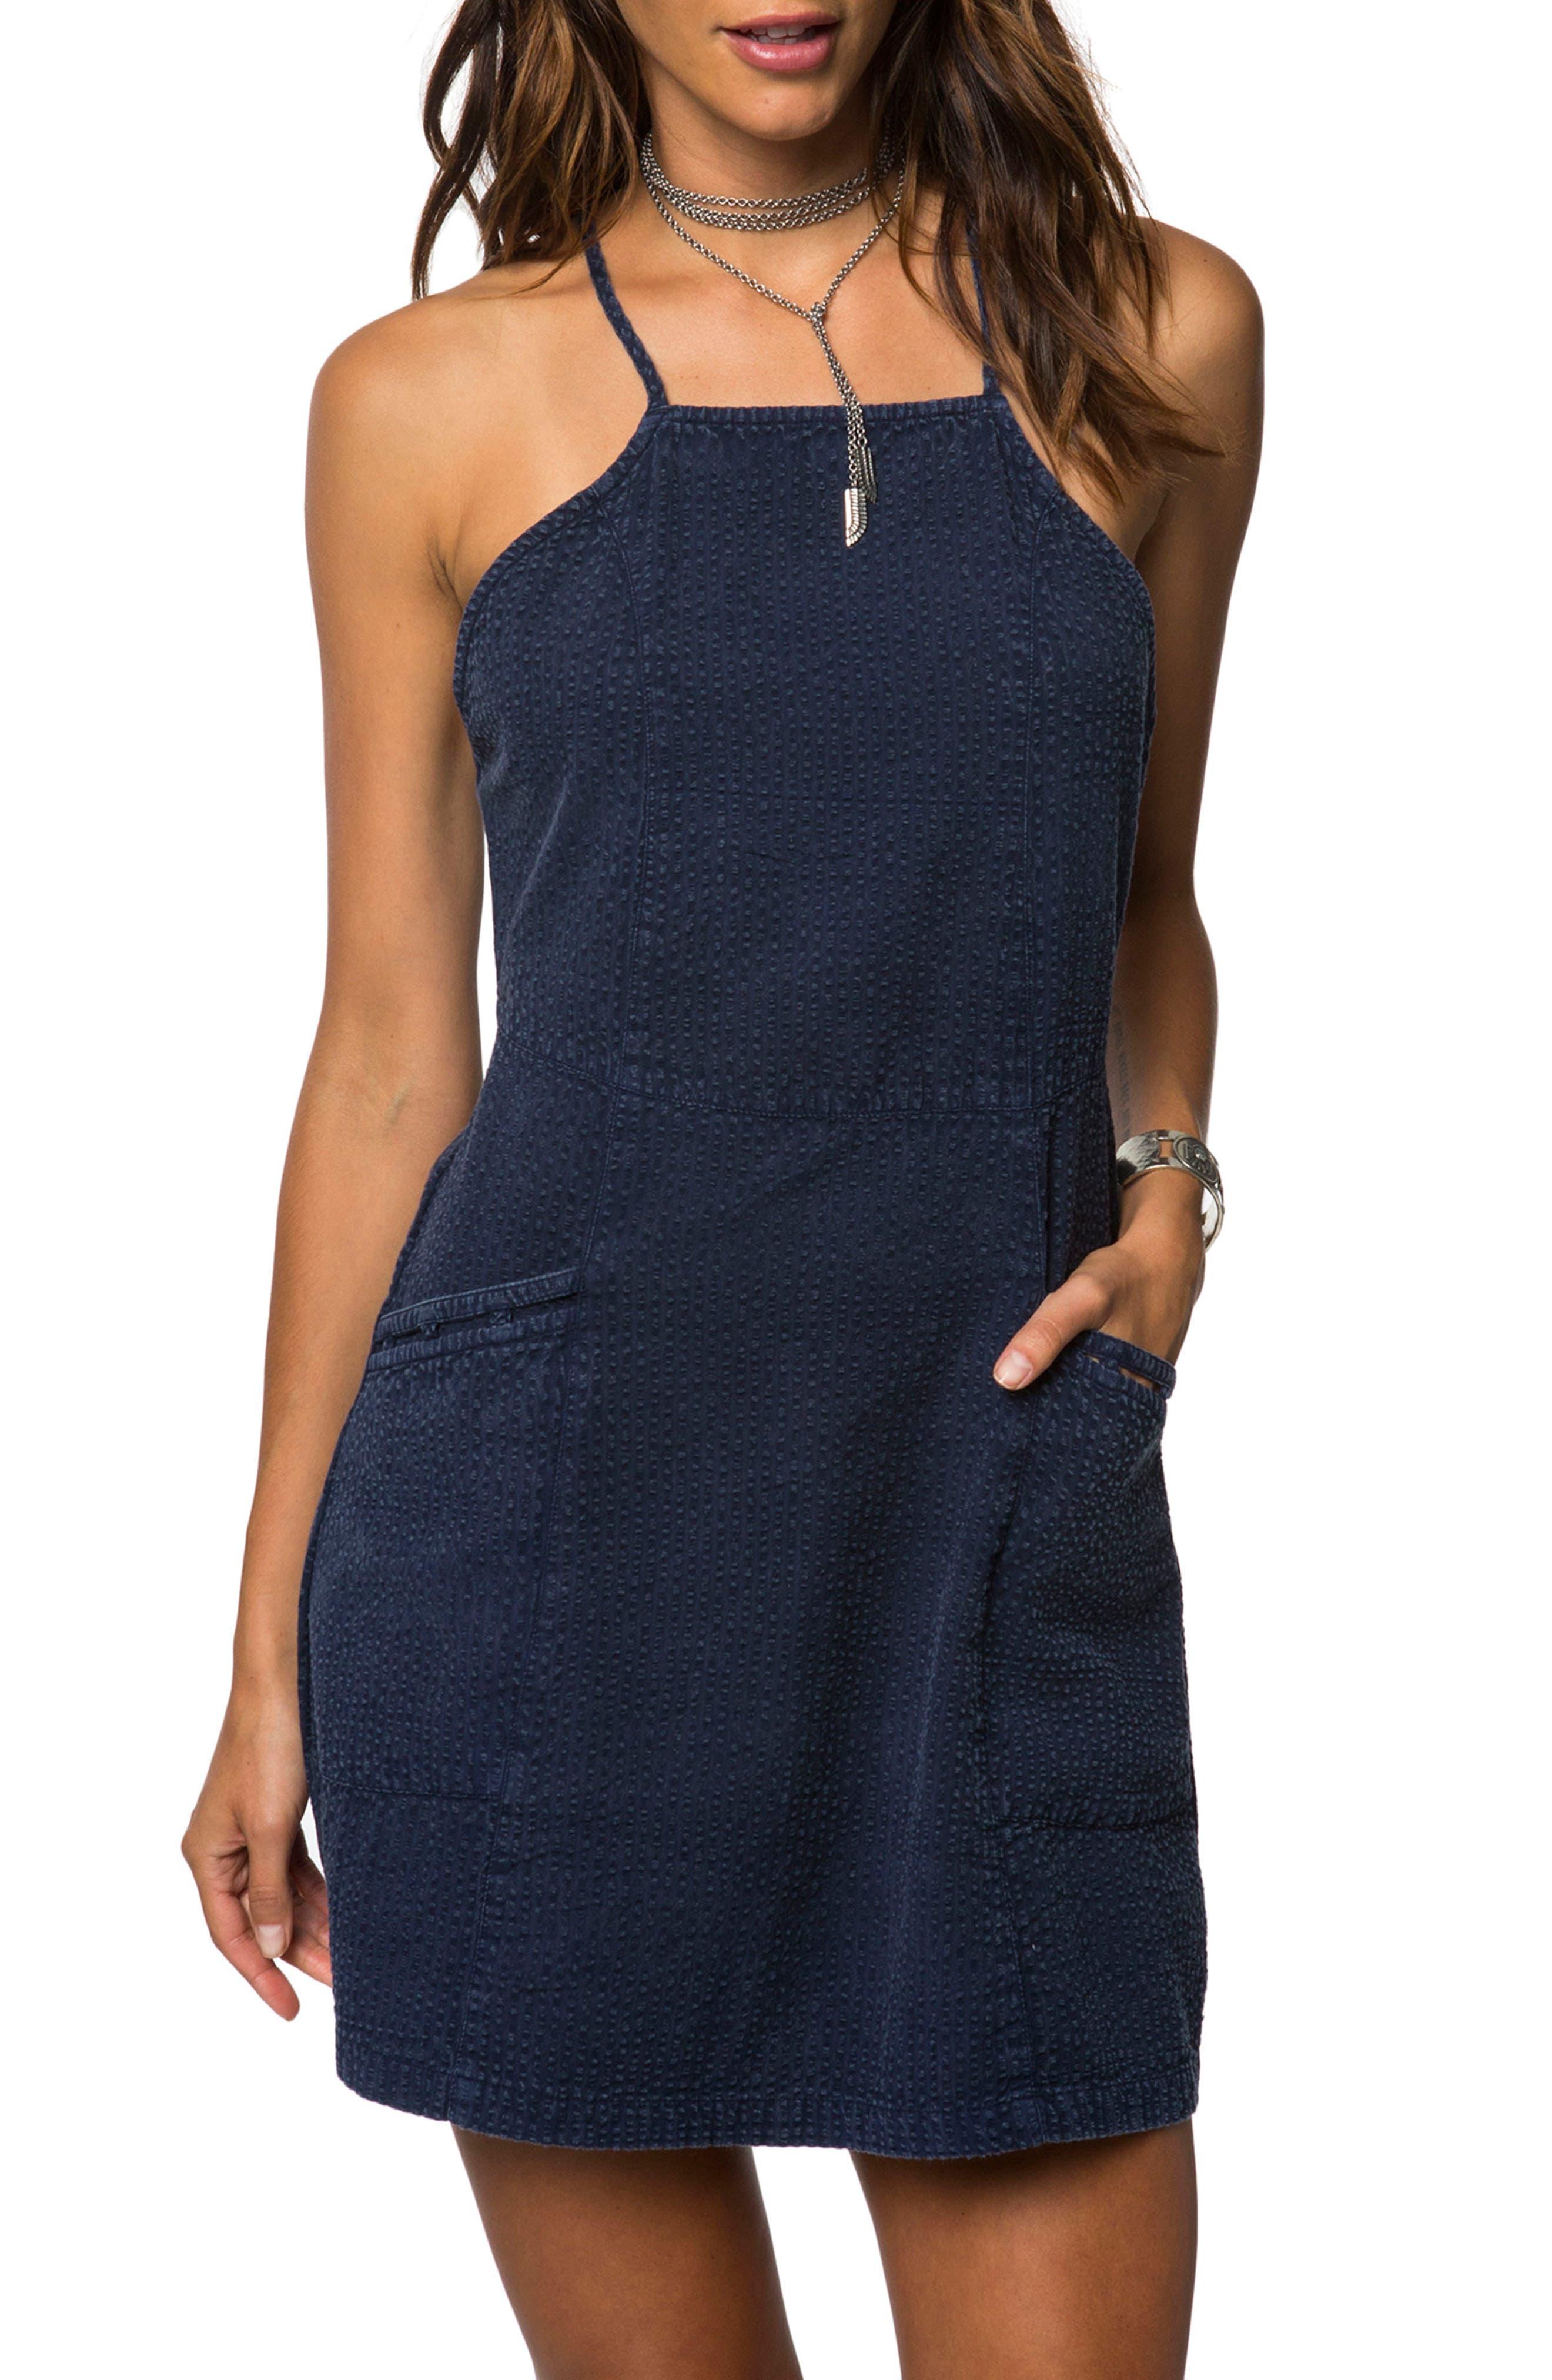 Alternate Image 1 Selected - O'Neill Esme Seersucker Apron Dress